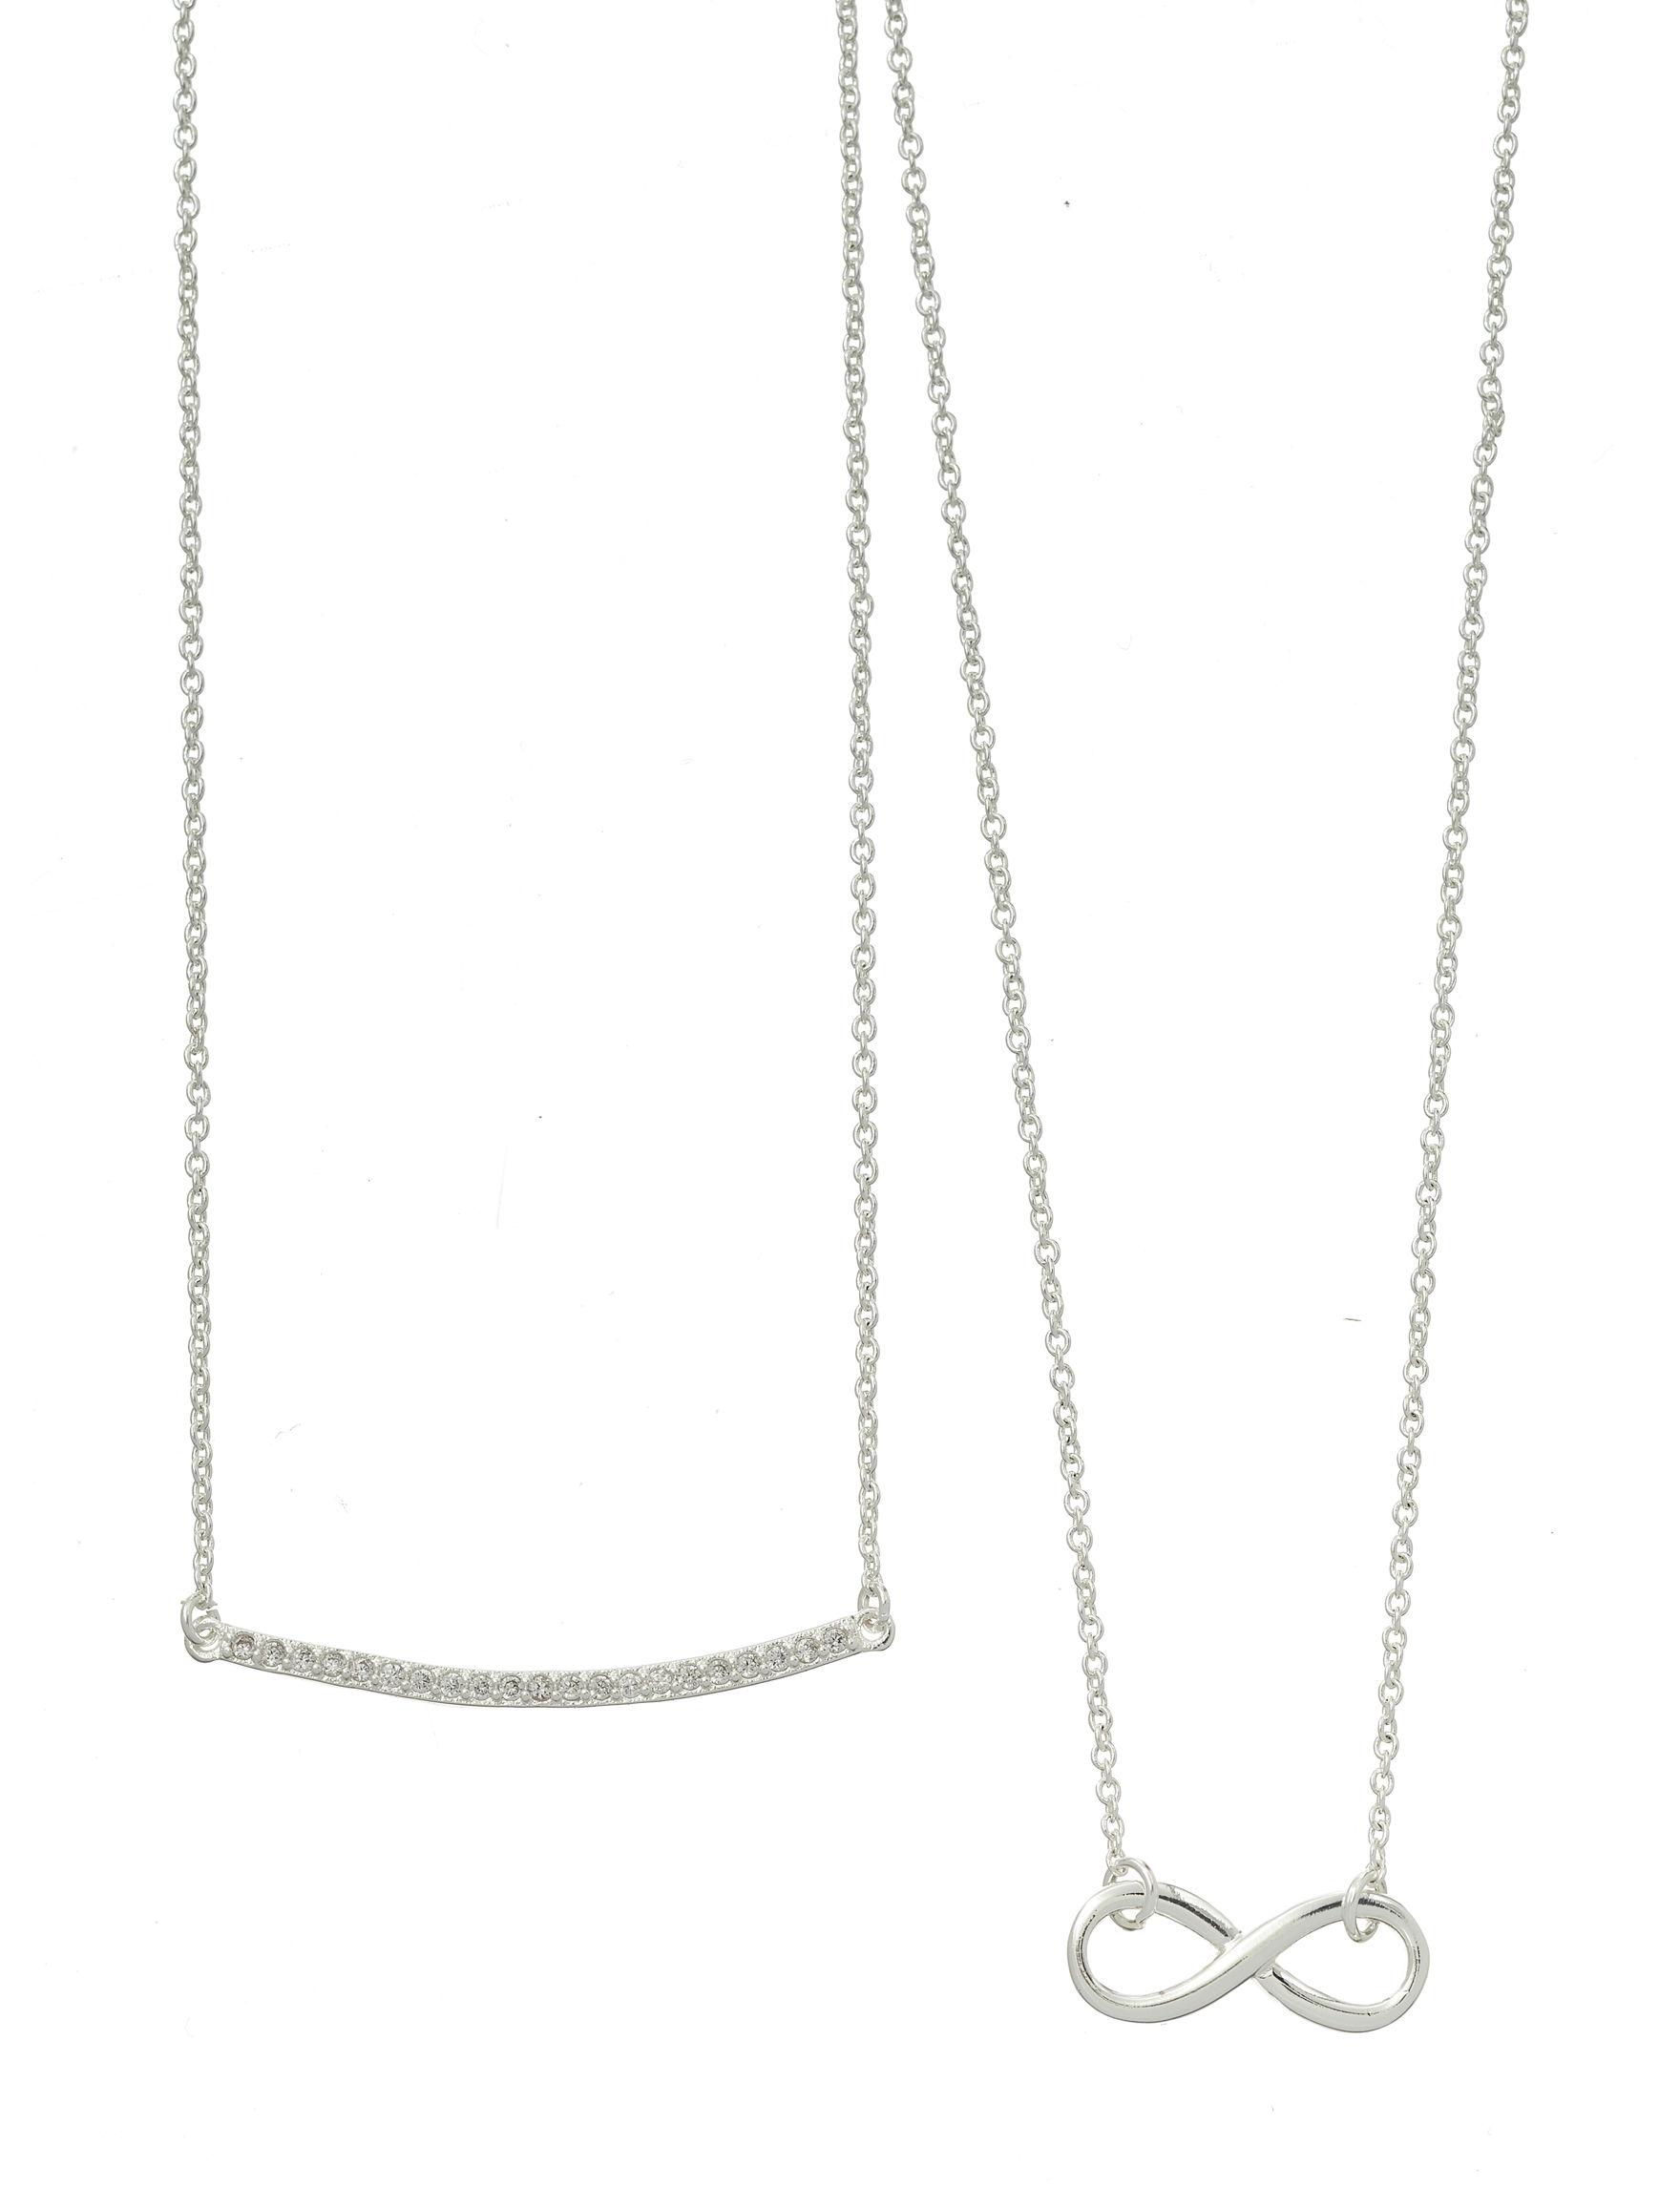 Marsala Silver Jewelry Sets Necklaces & Pendants Fine Jewelry